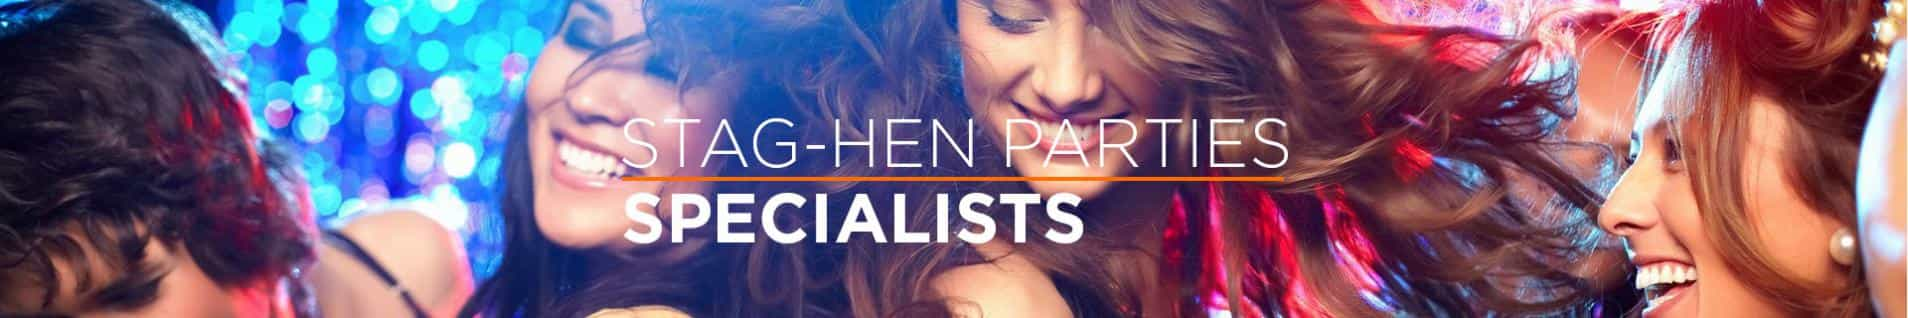 Parties specialist